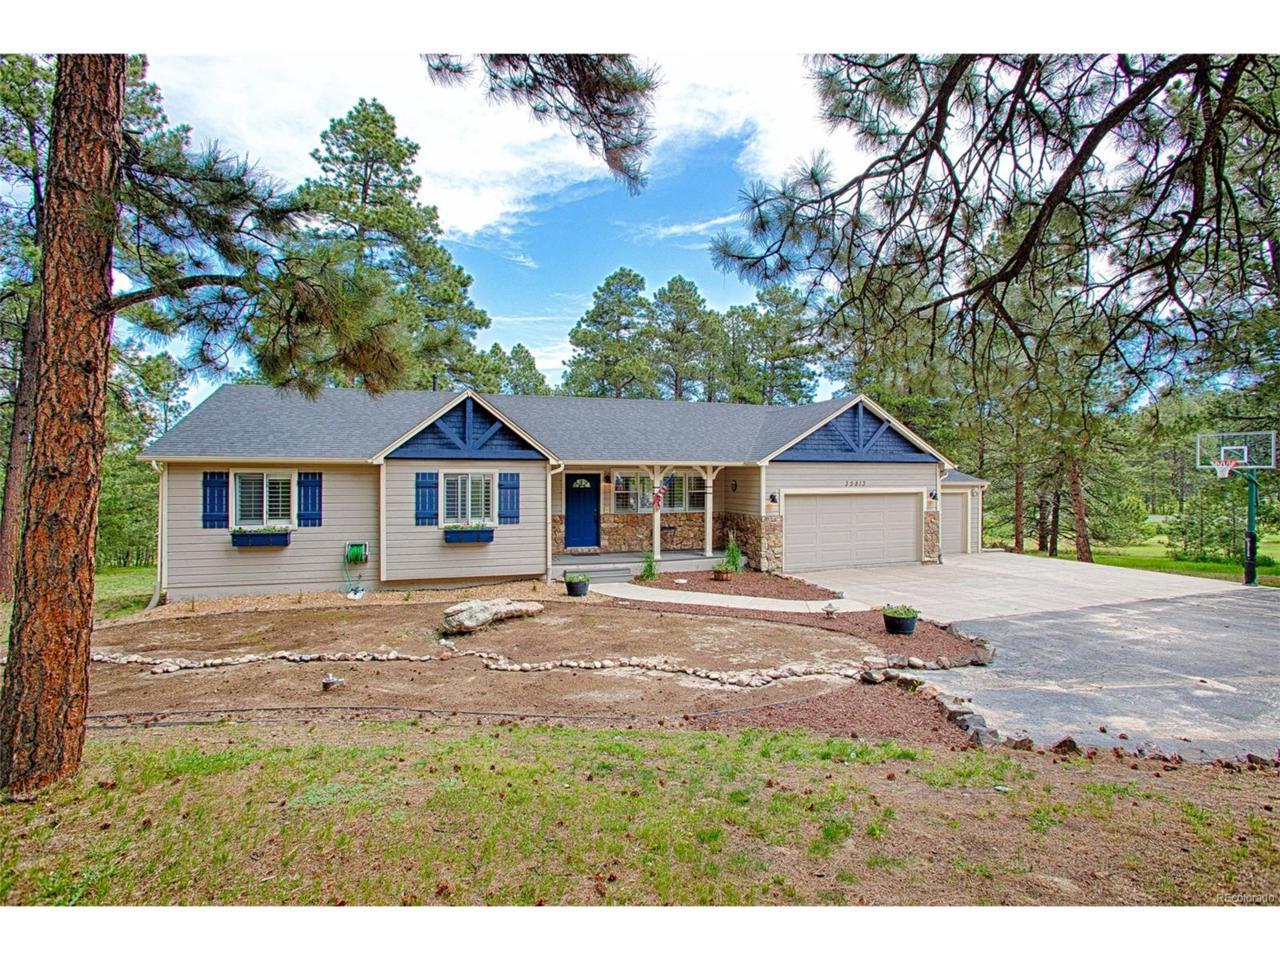 35813 Elkridge Run, Elizabeth, CO 80107 (MLS #2446225) :: 8z Real Estate